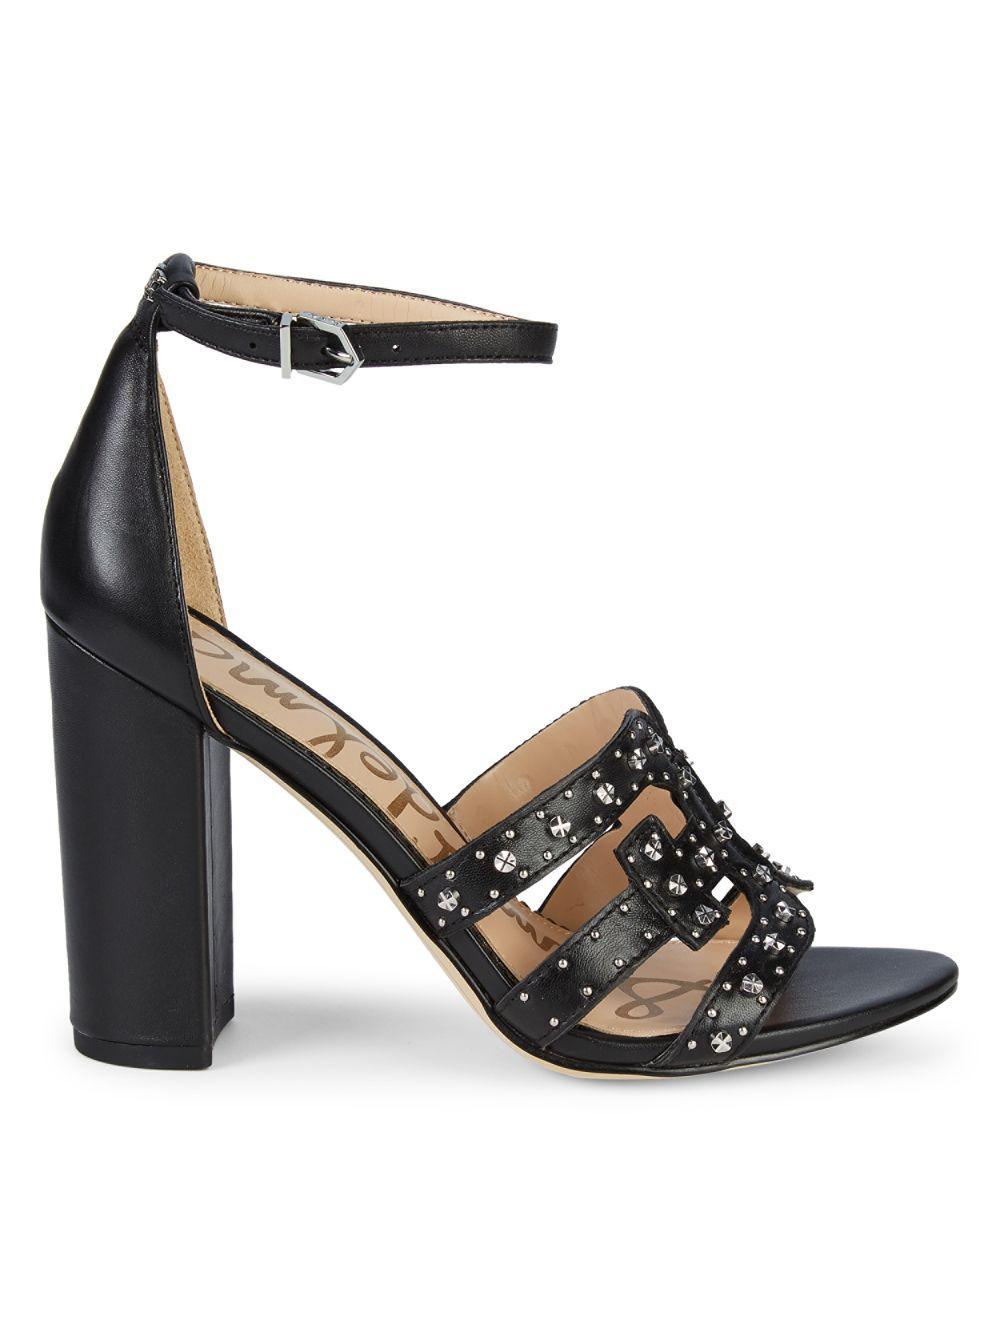 0aae608cfbba Lyst - Sam Edelman Pacific Northwest Yasha Leather Heeled Sandals in ...